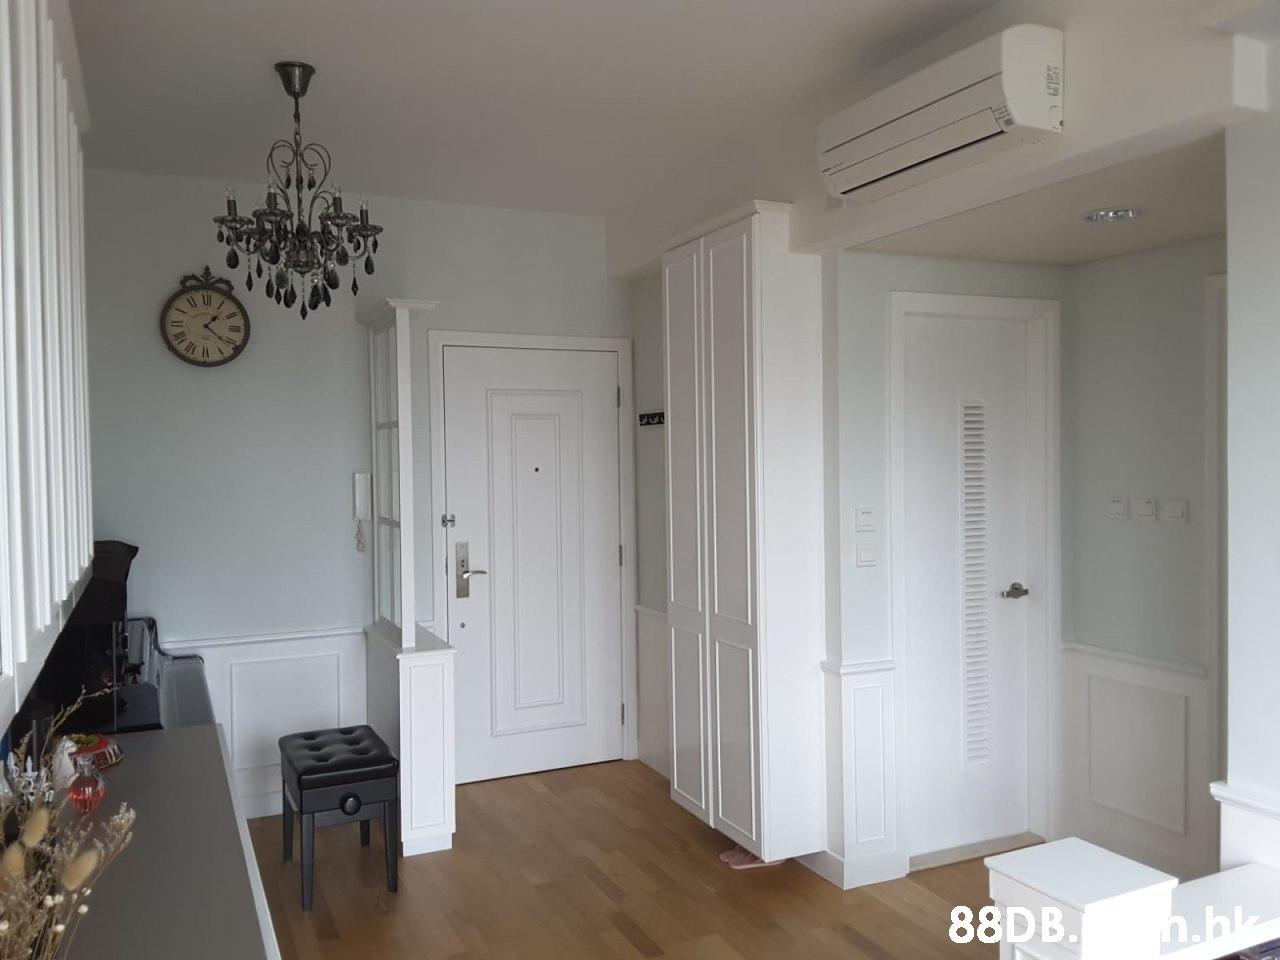 88DB  Room,Property,Floor,Wall,Building